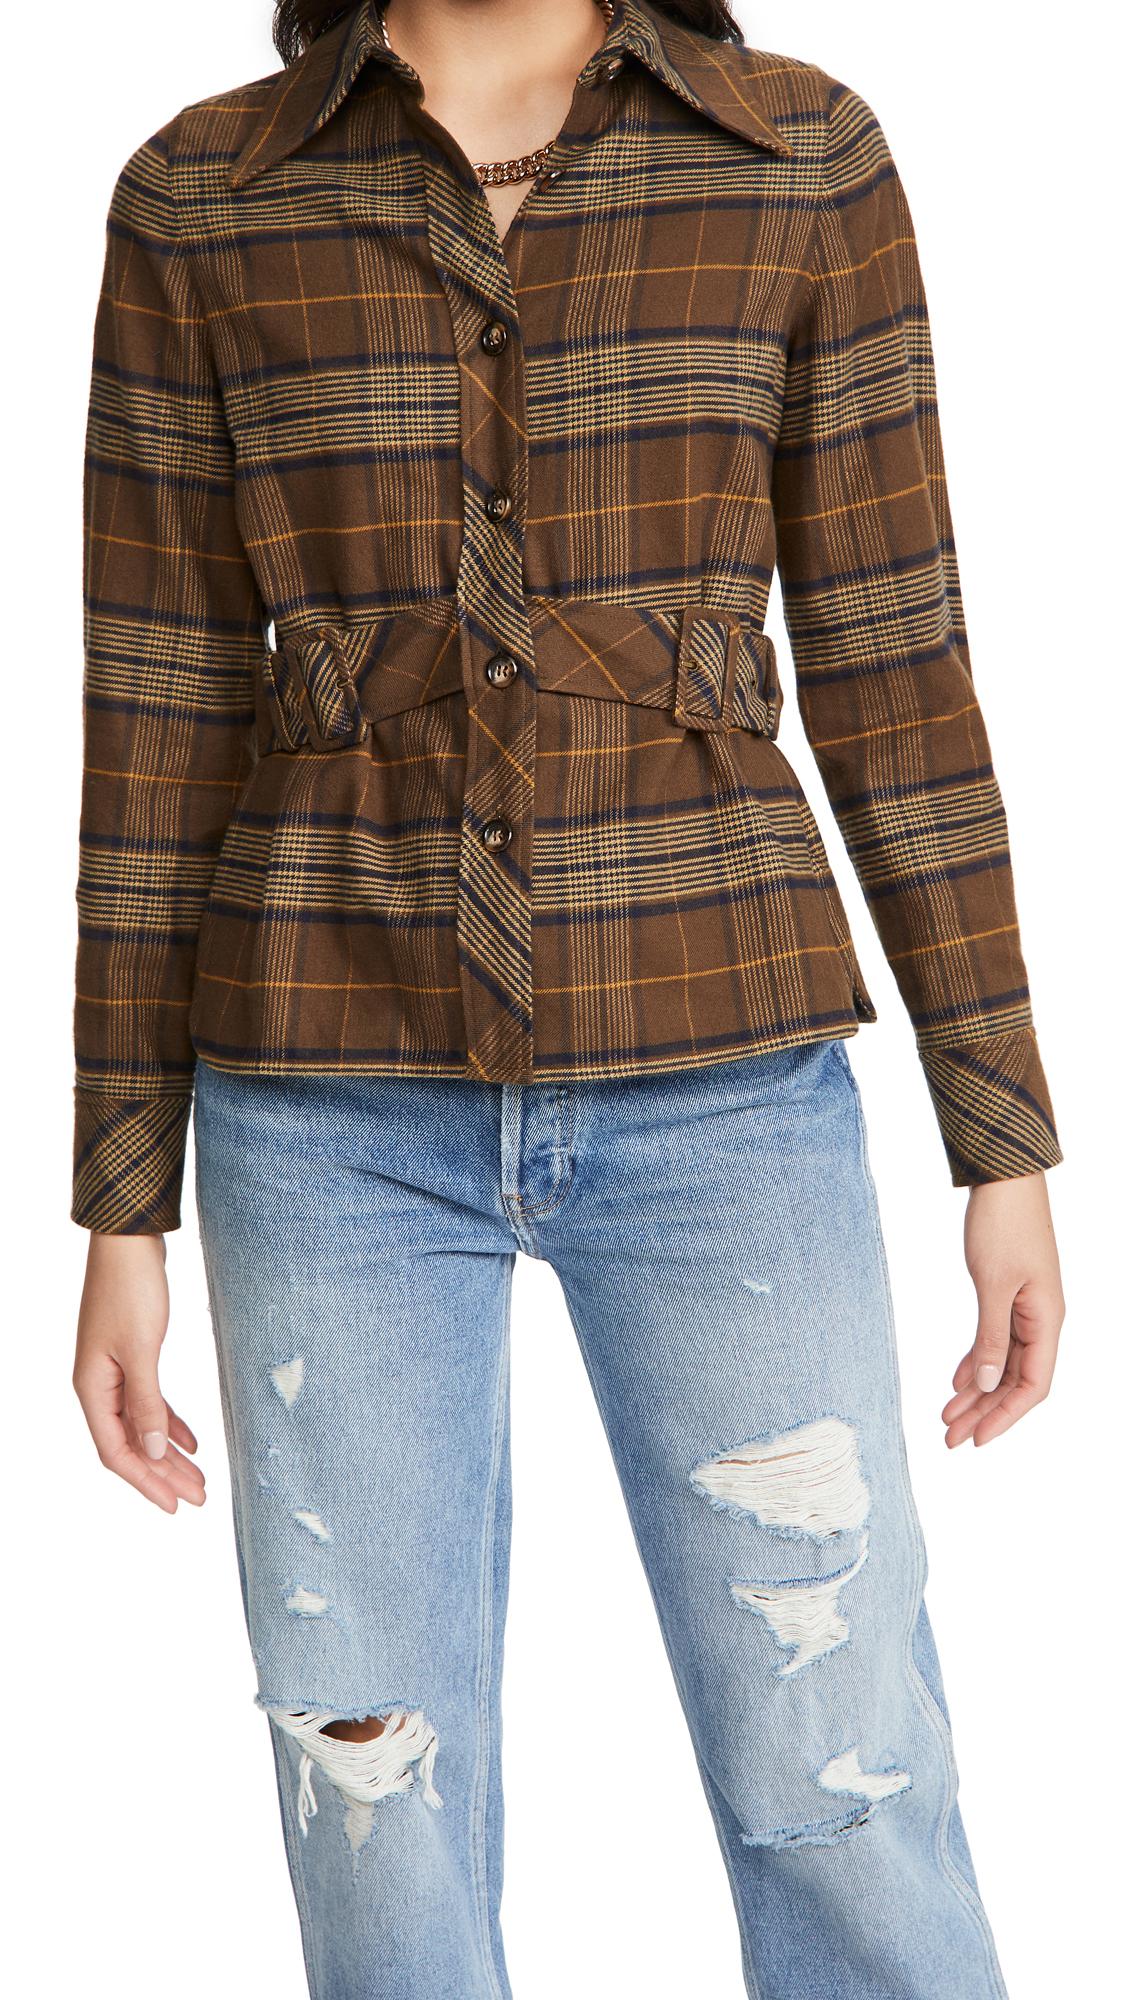 The Marc Jacobs The Plaid Shirt